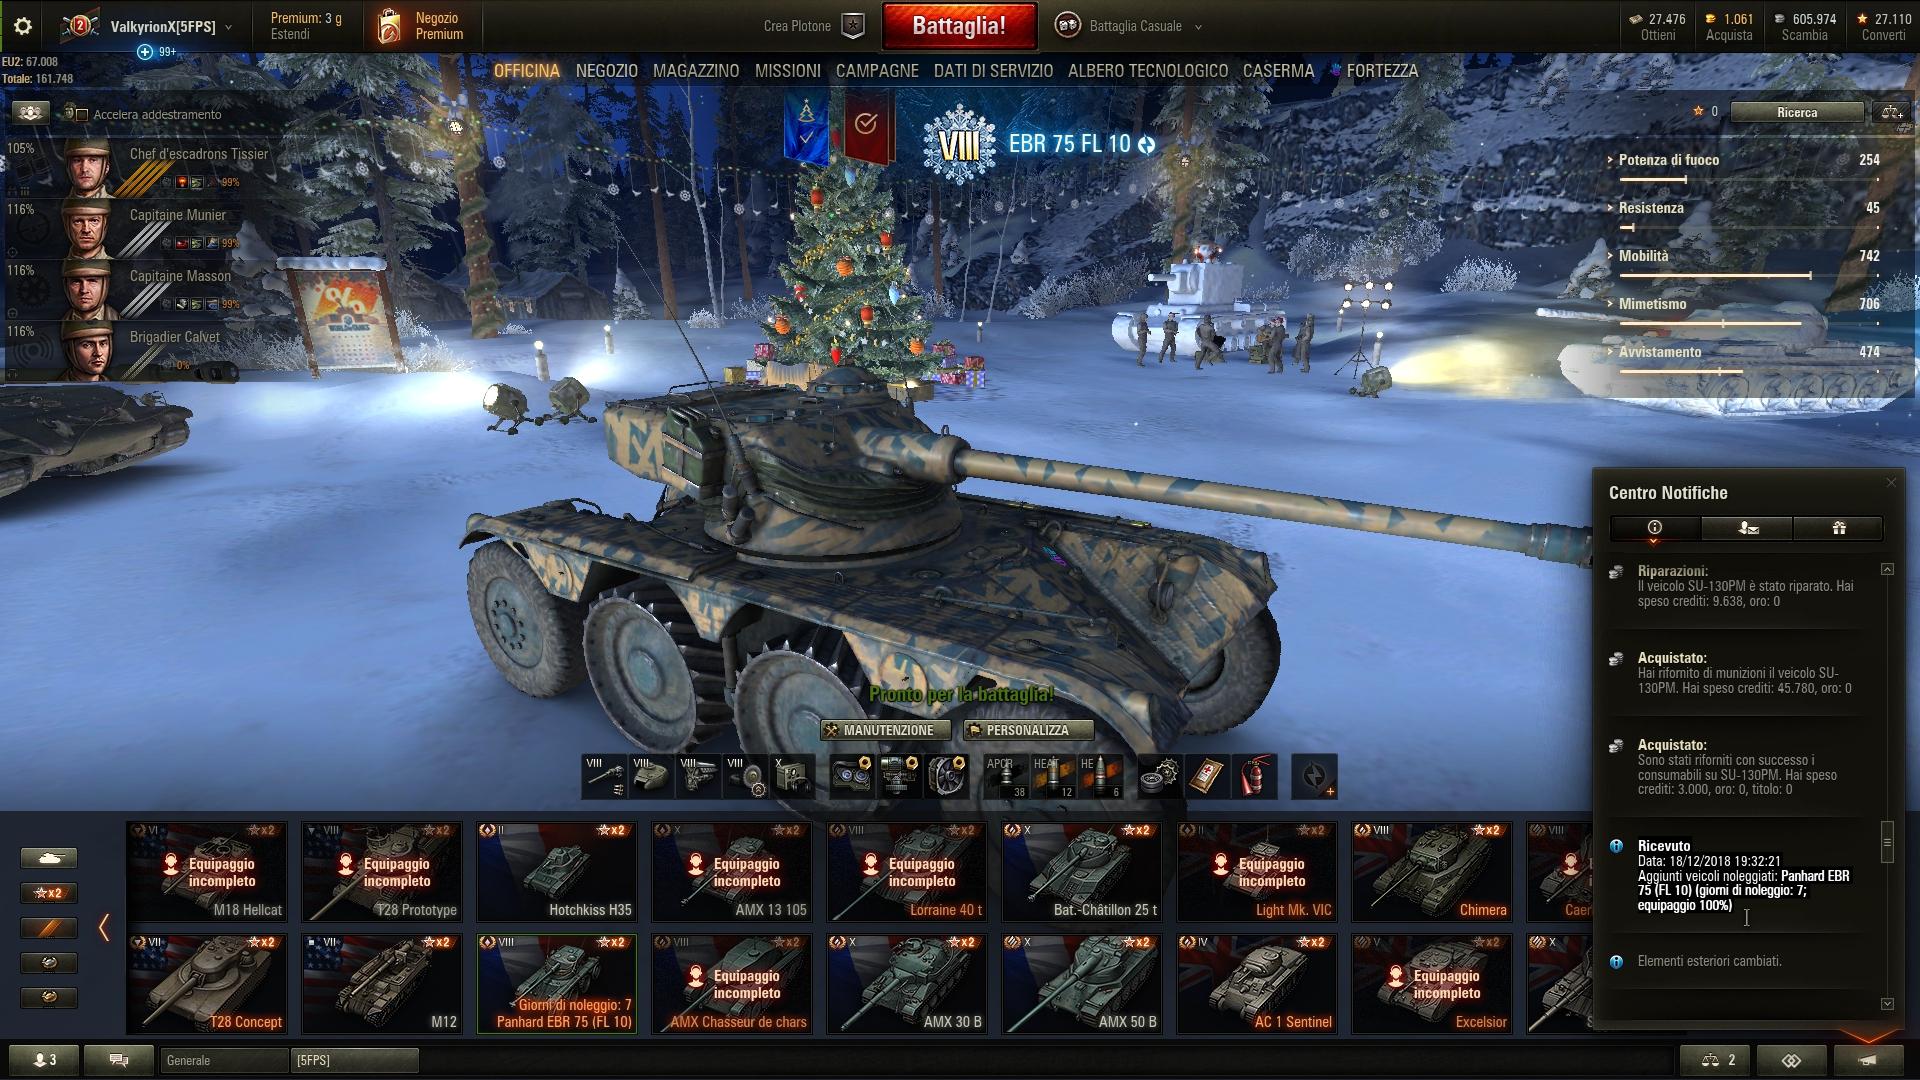 Panhard EBR 75 (FL10) -tier 8 wheeled tank- [7 days RENTAL CODE